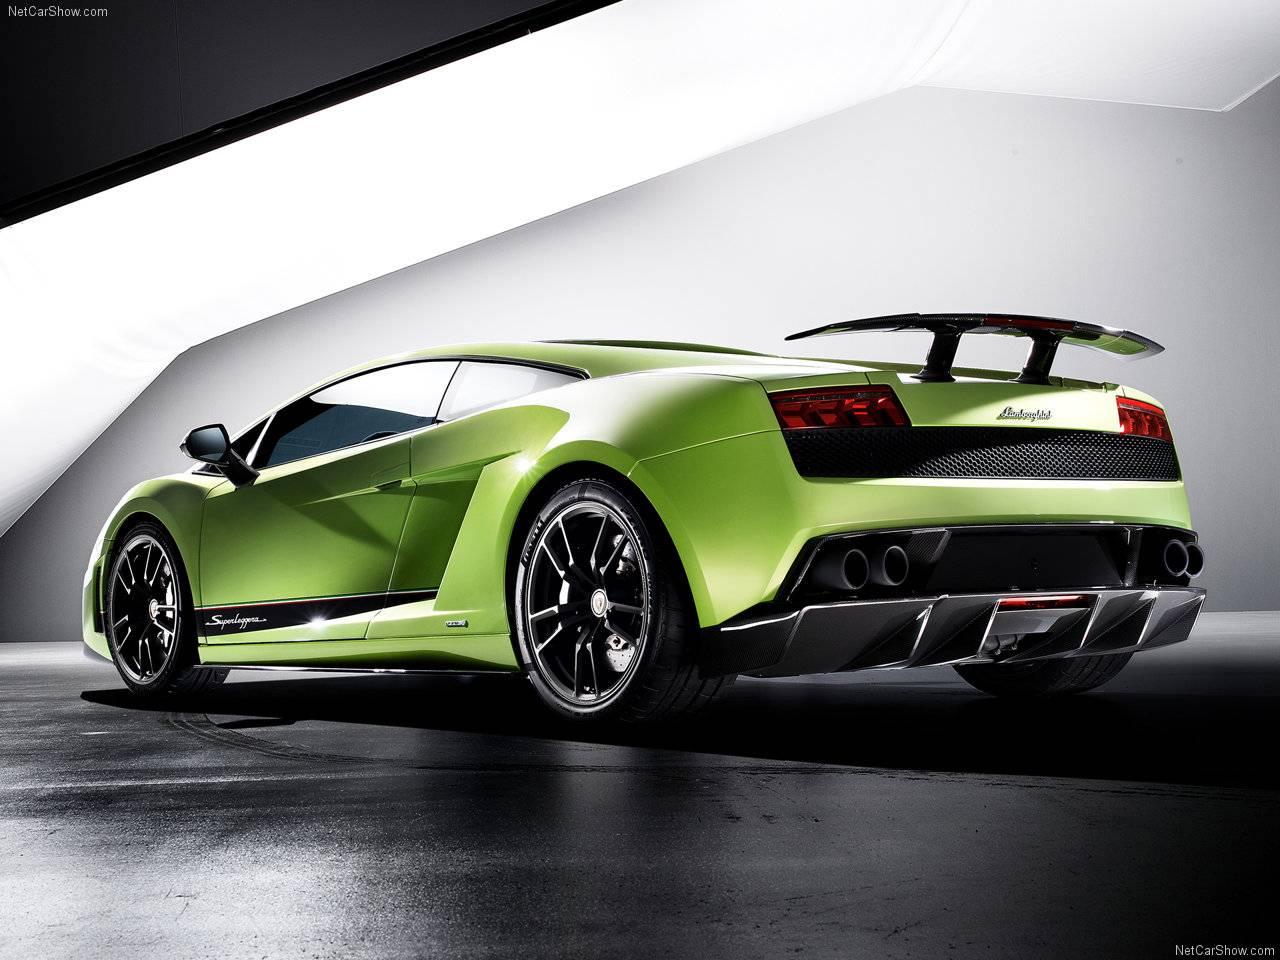 http://4.bp.blogspot.com/_lsyt_wQ2awY/TDipMRgclVI/AAAAAAAB8_4/LwO3Zx9IIWo/s1600/Lamborghini-Gallardo_LP570-4_Superleggera_2011_1280x960_wallpaper_03.jpg